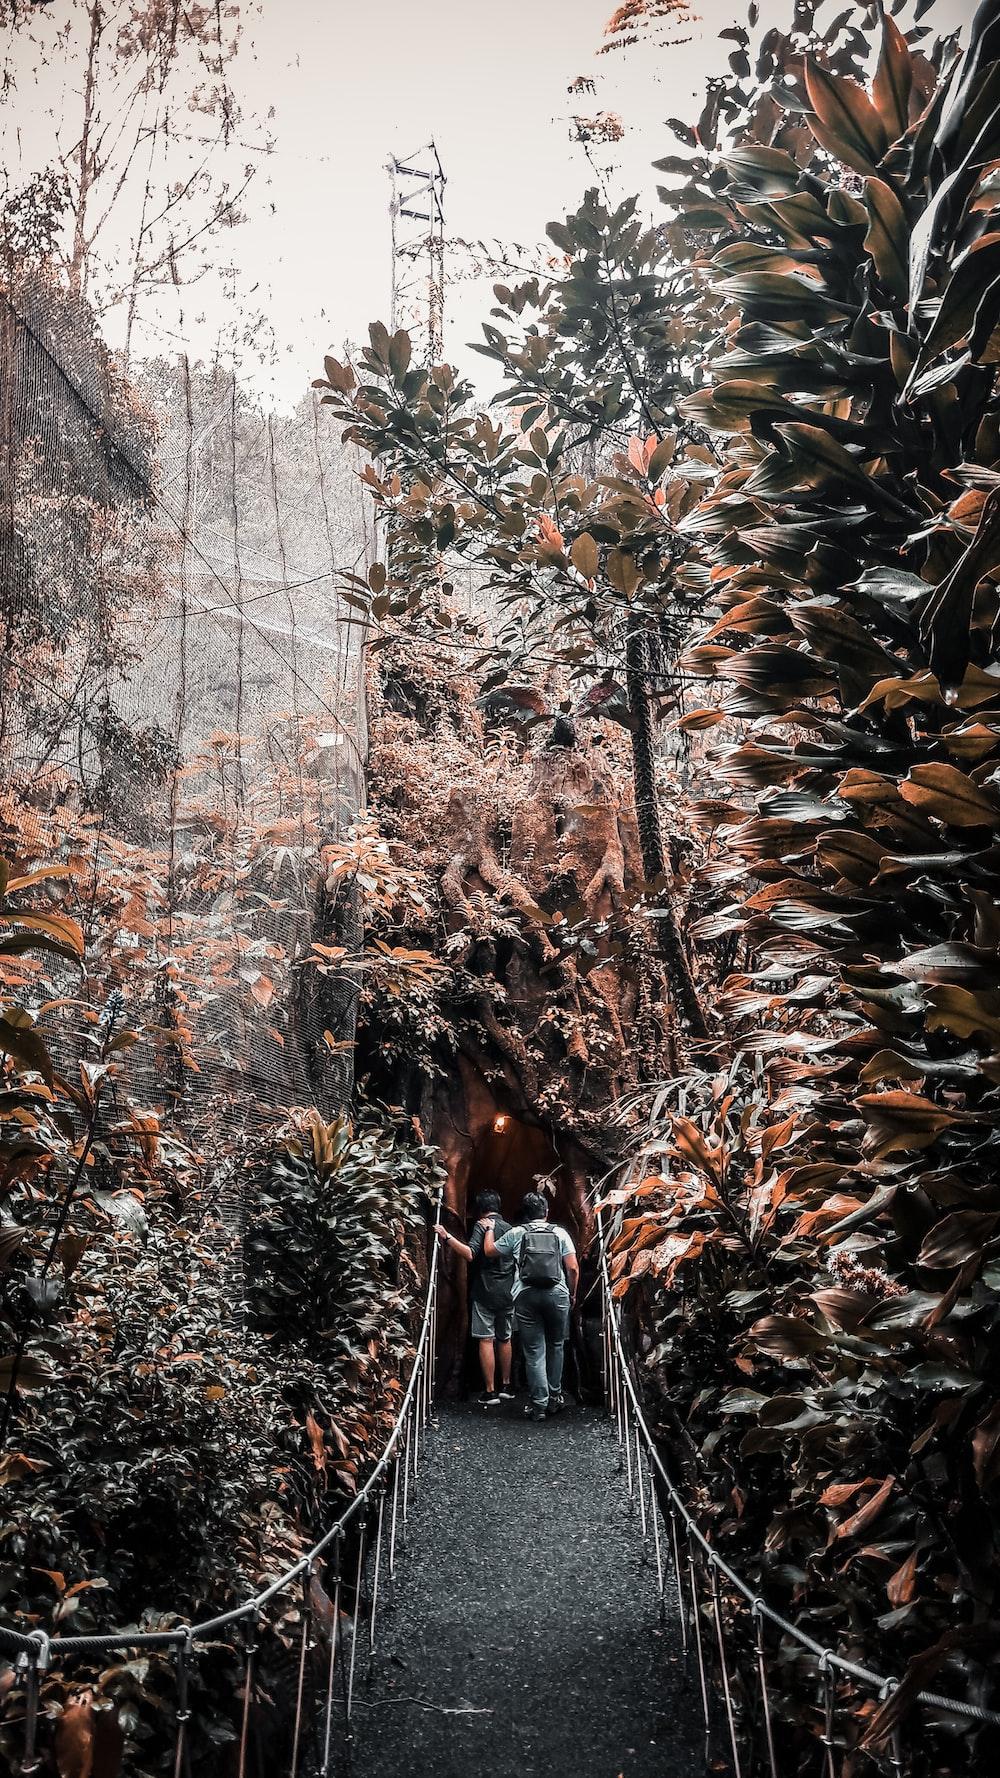 two person walking on bridge between trees during daytime